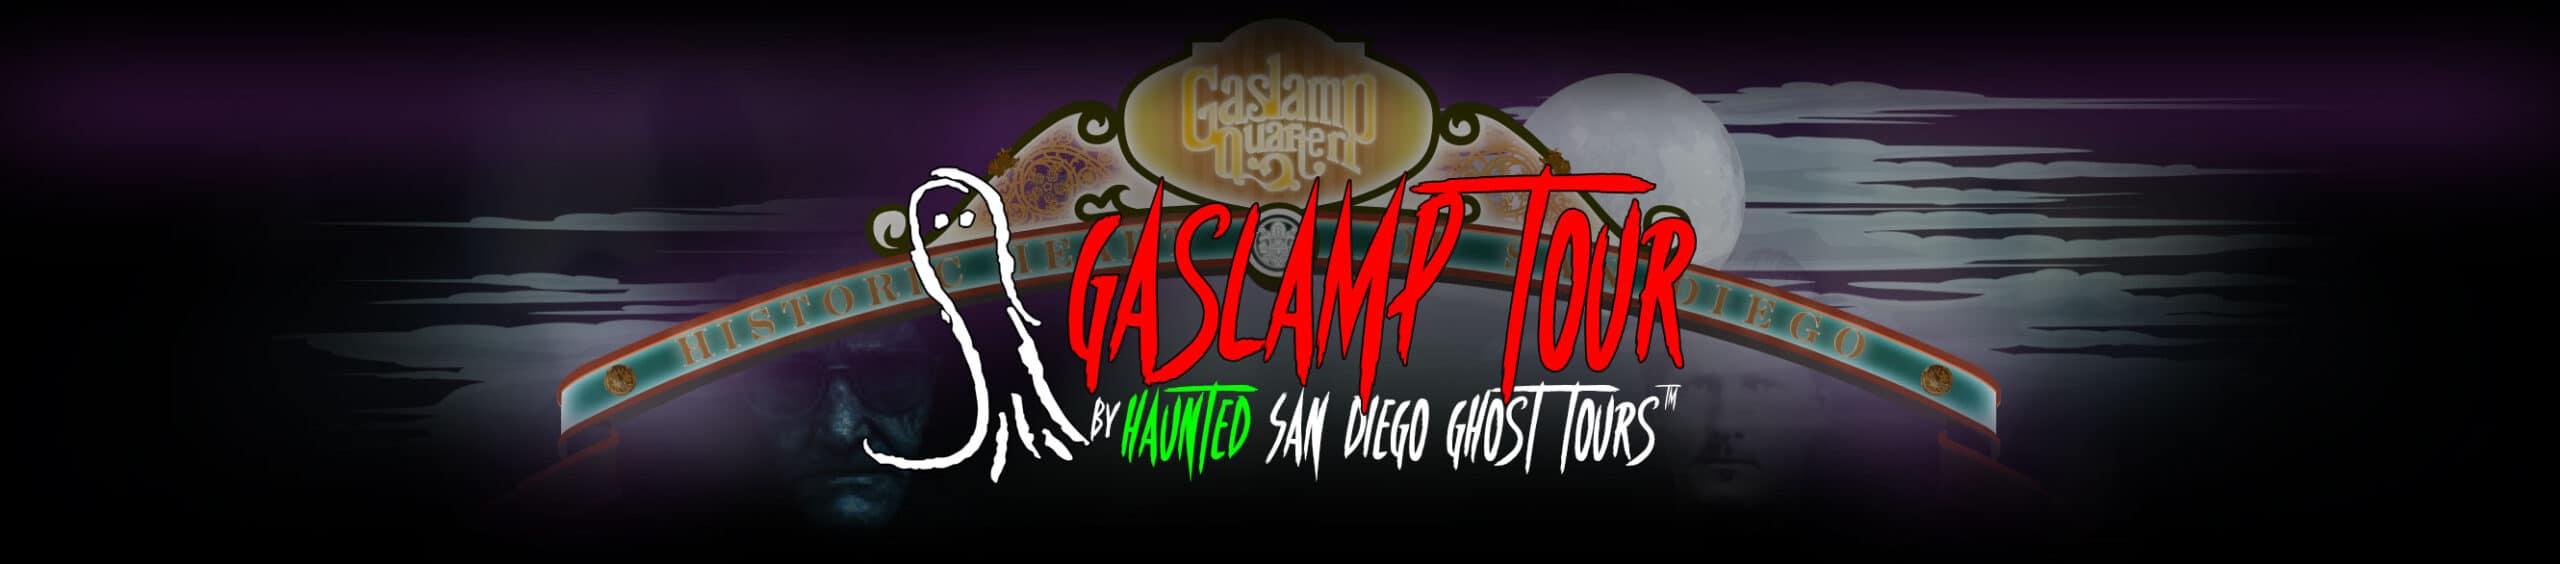 haunted-san-diego-gaslamp-tour-hero-new-bigger-e